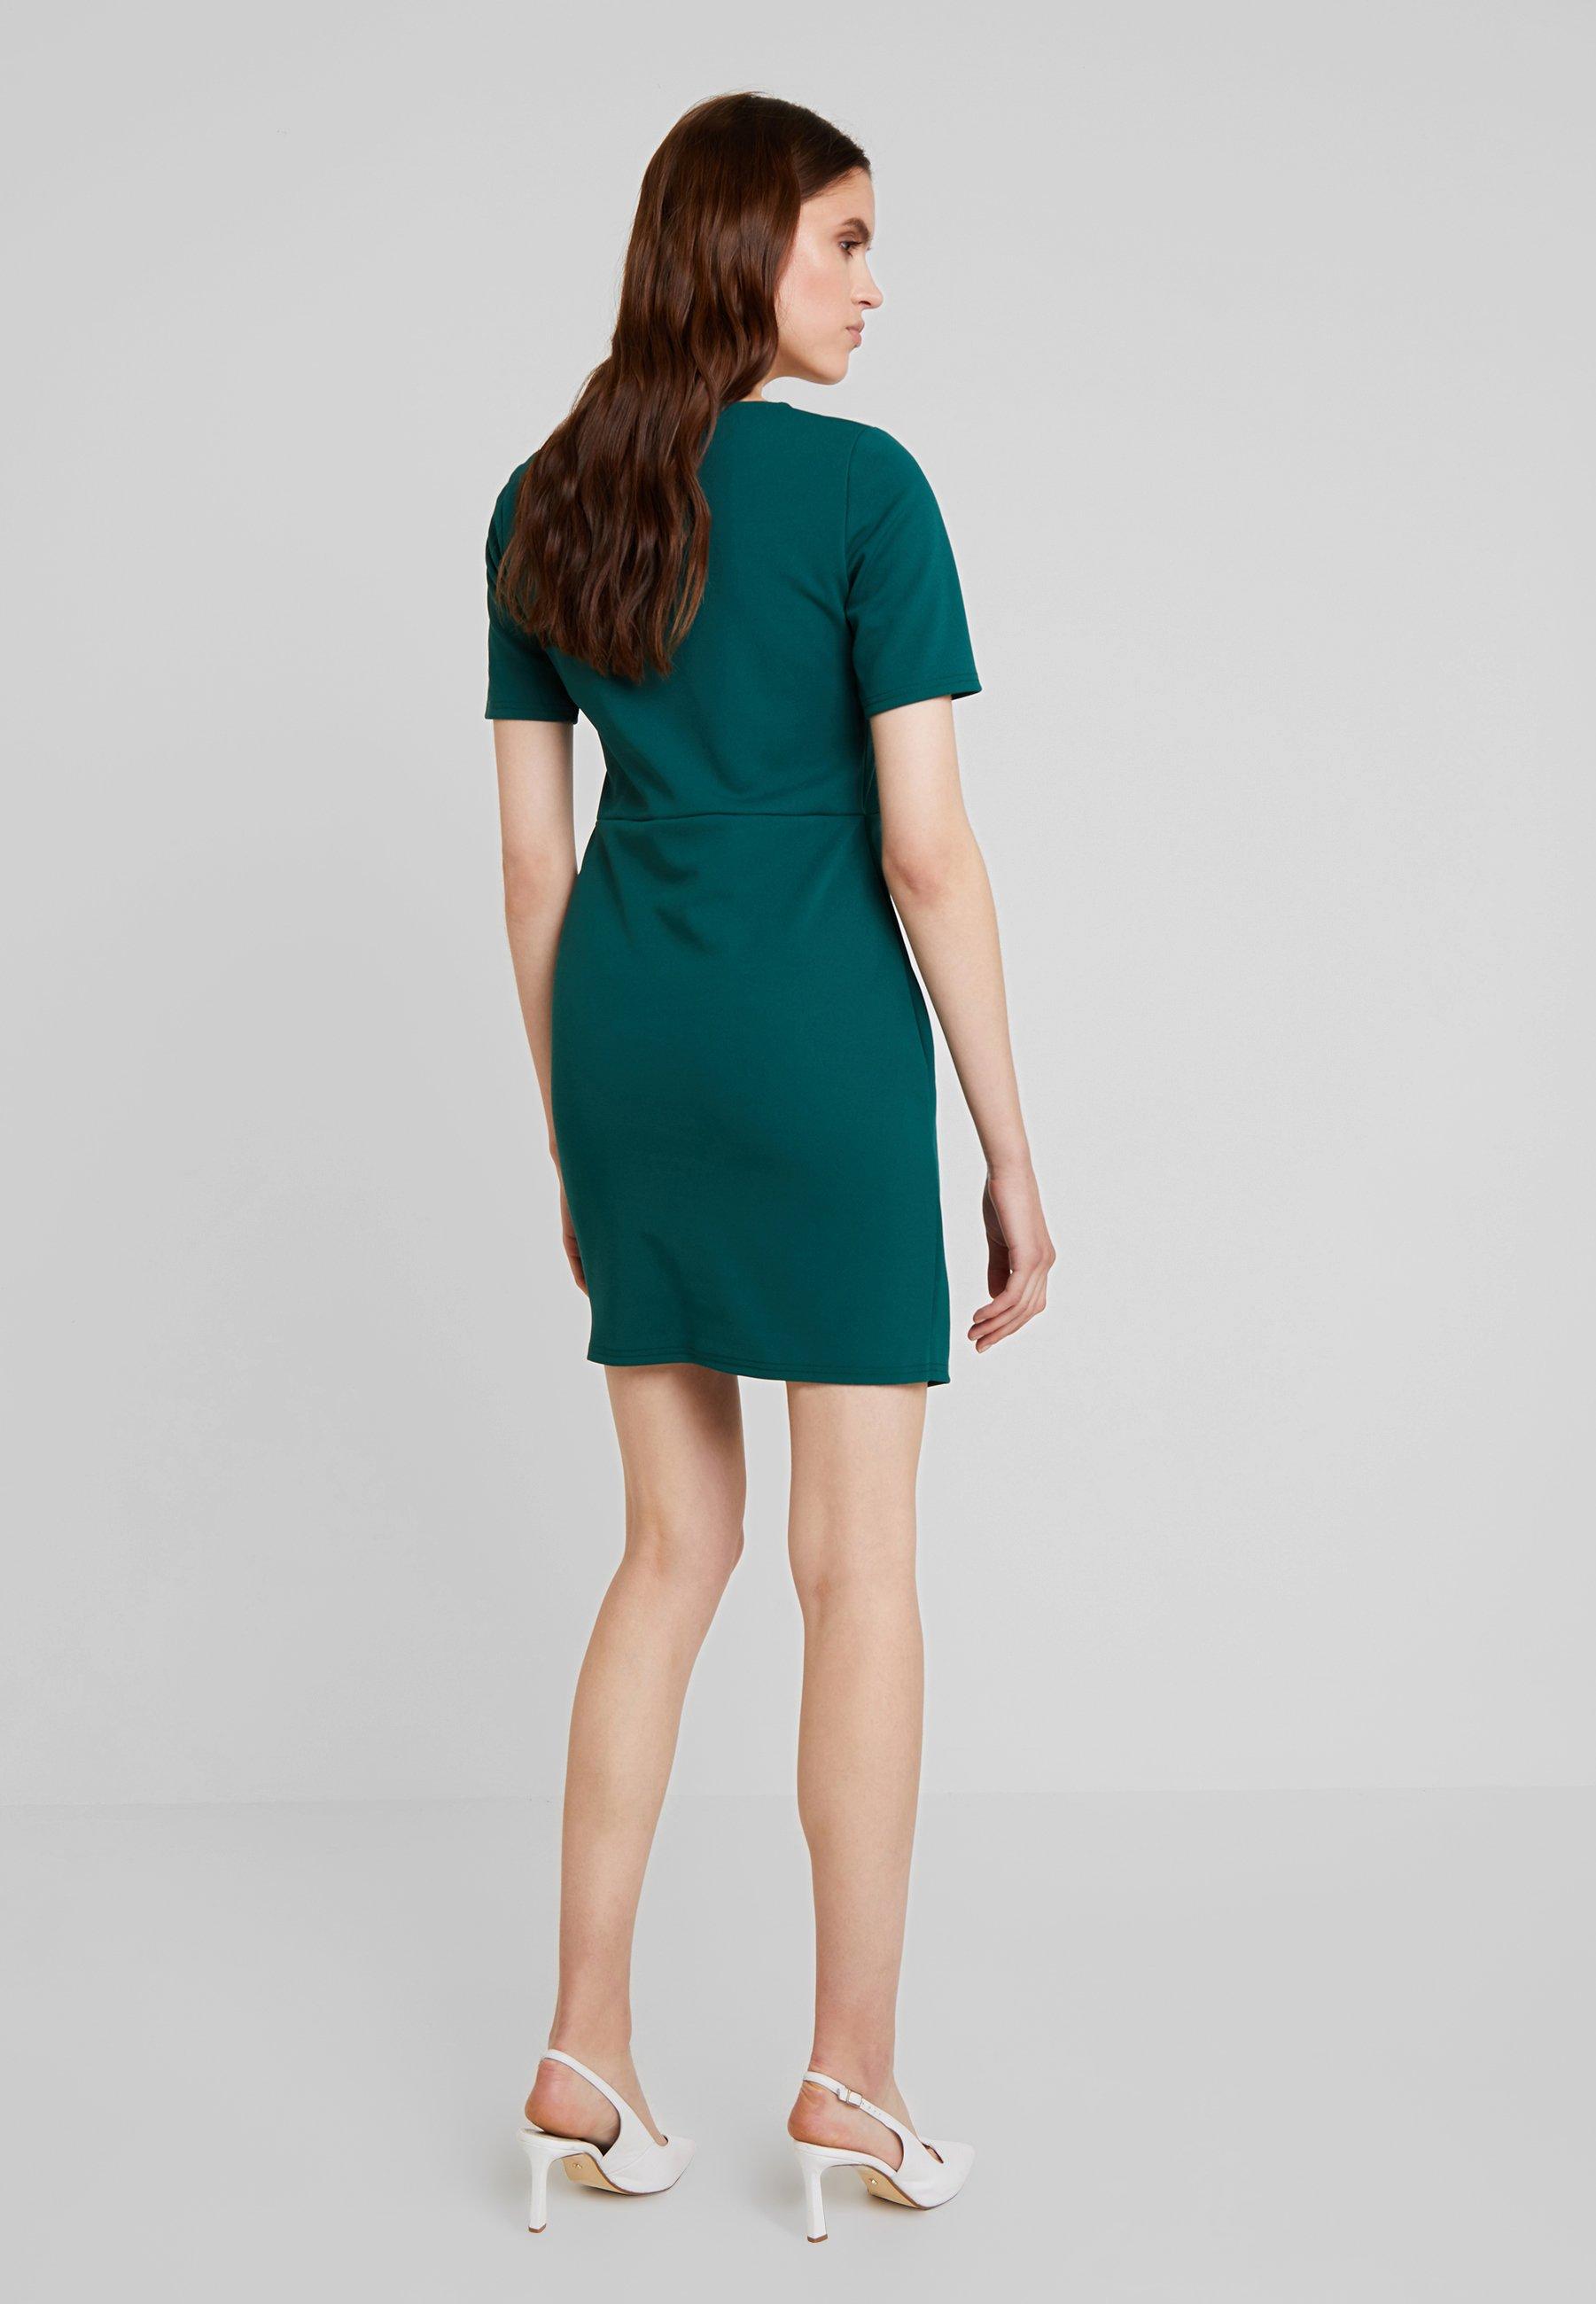 Wrap Green Fourreau Skirt BodyconRobe Dorothy Perkins fb6gvImYy7